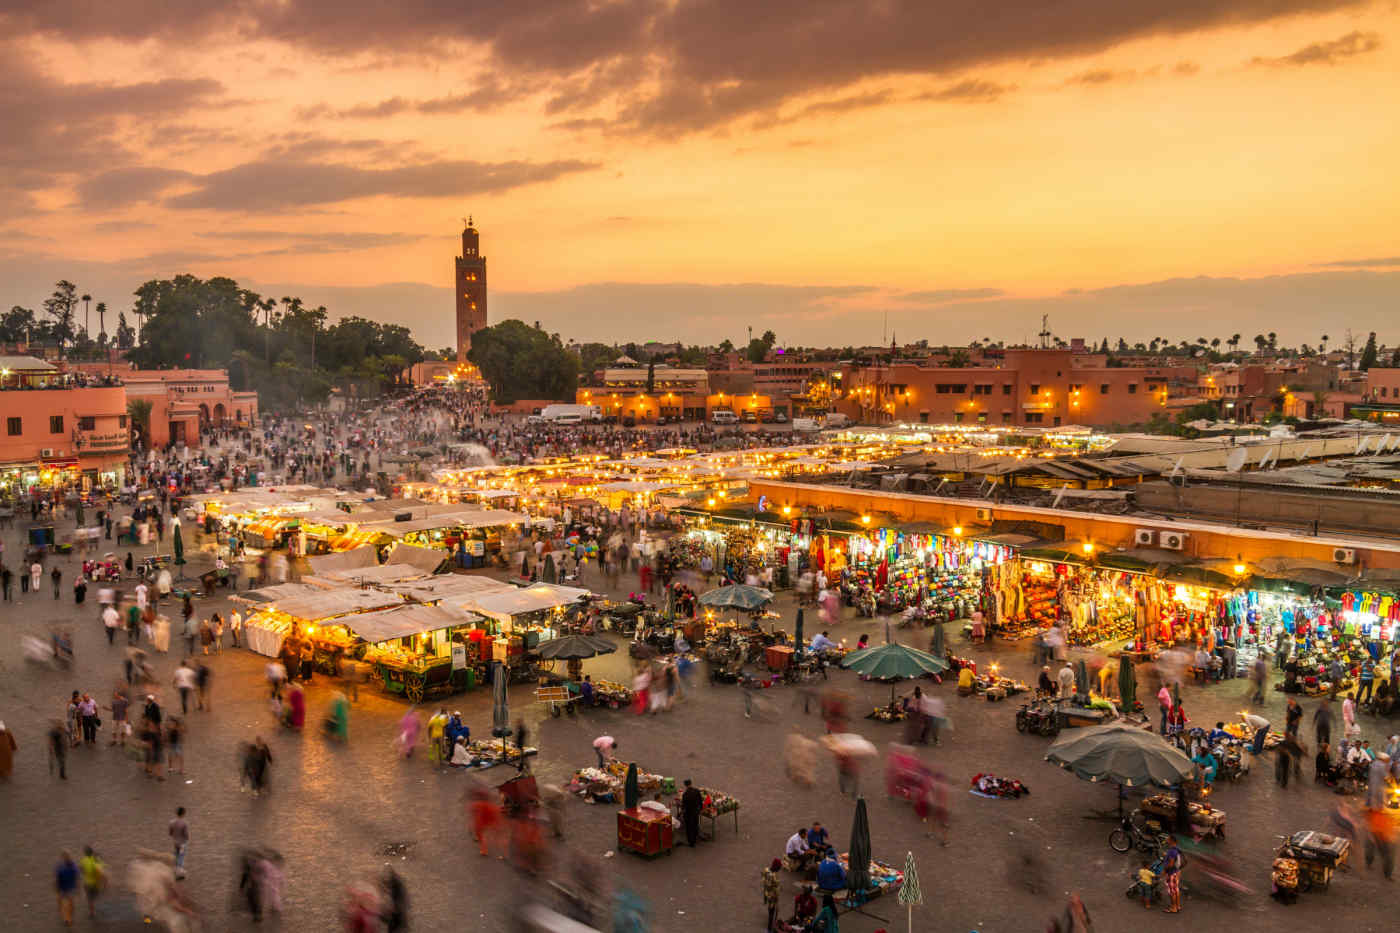 Market in Marrakesh, Morocco